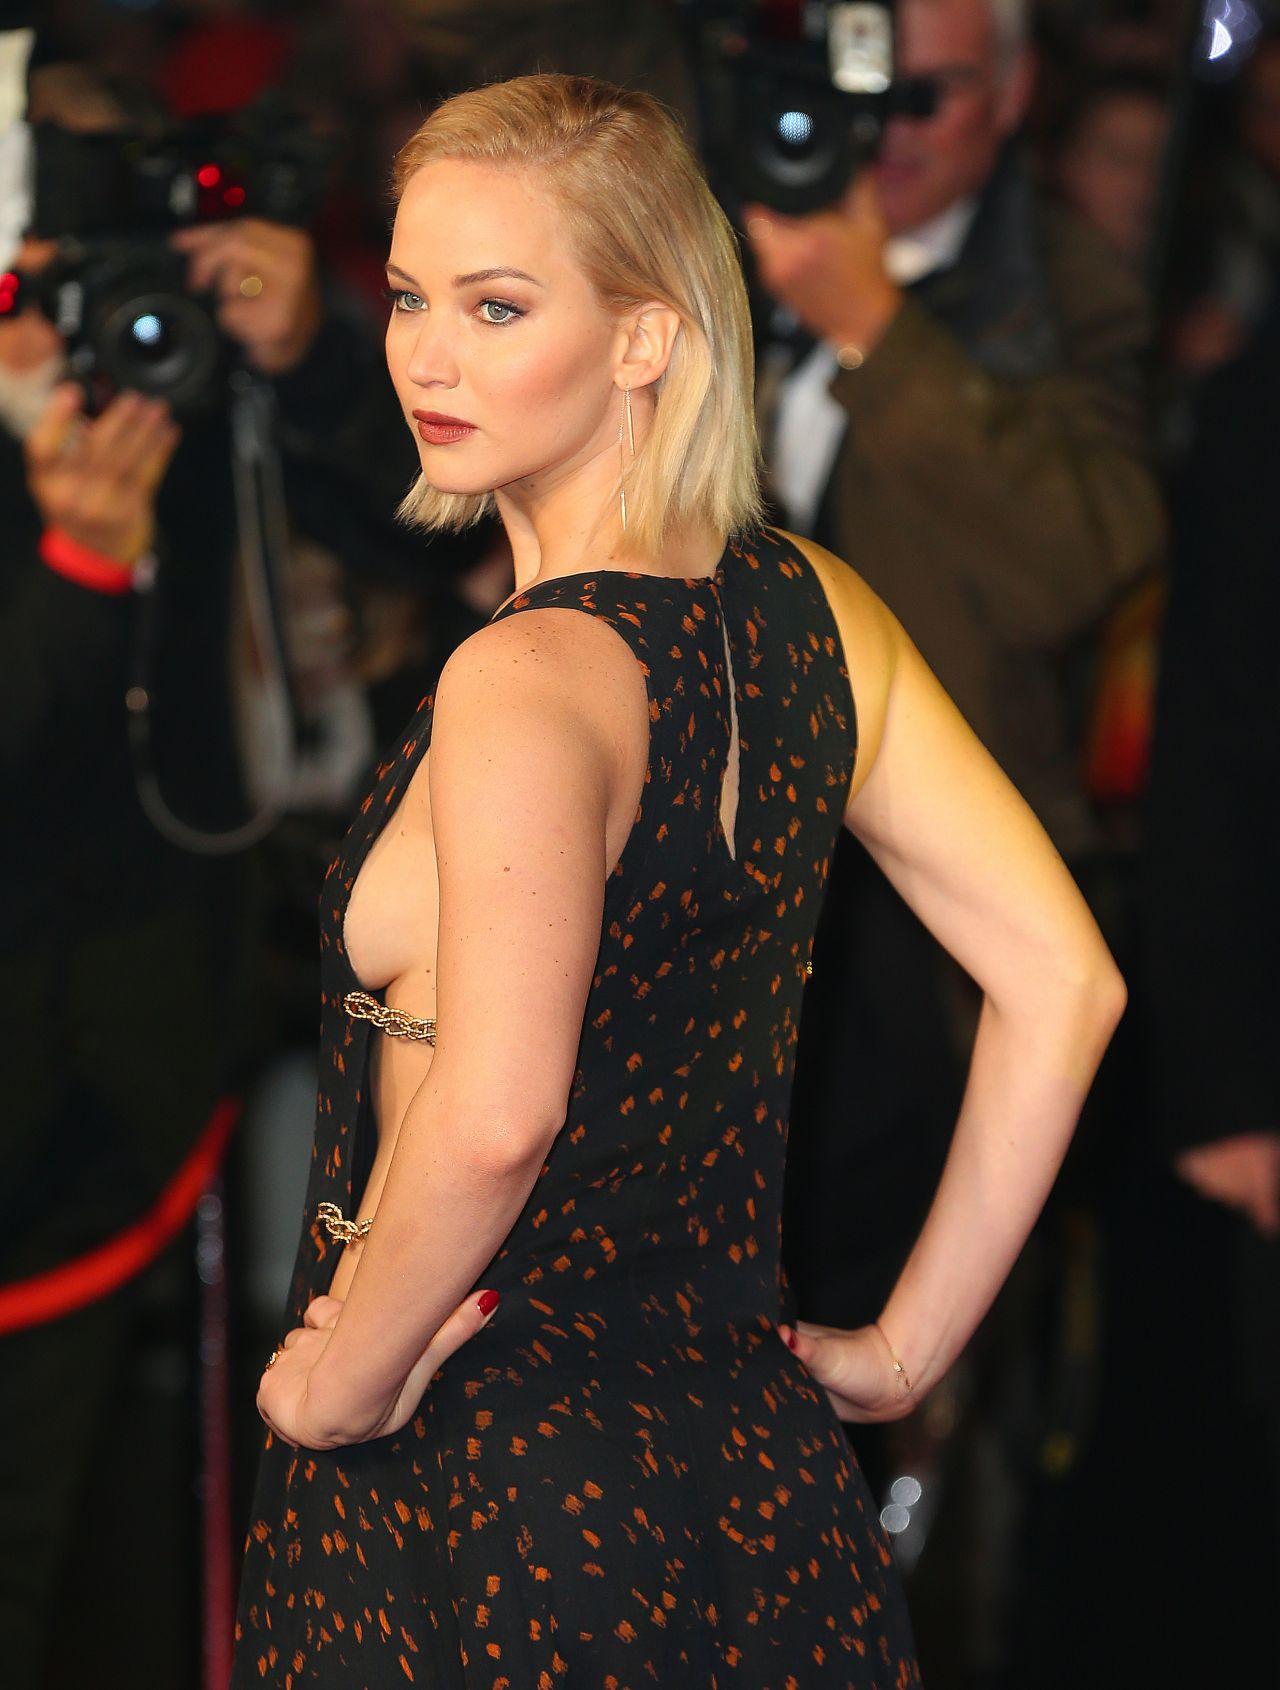 Jennifer lawrence nude fap